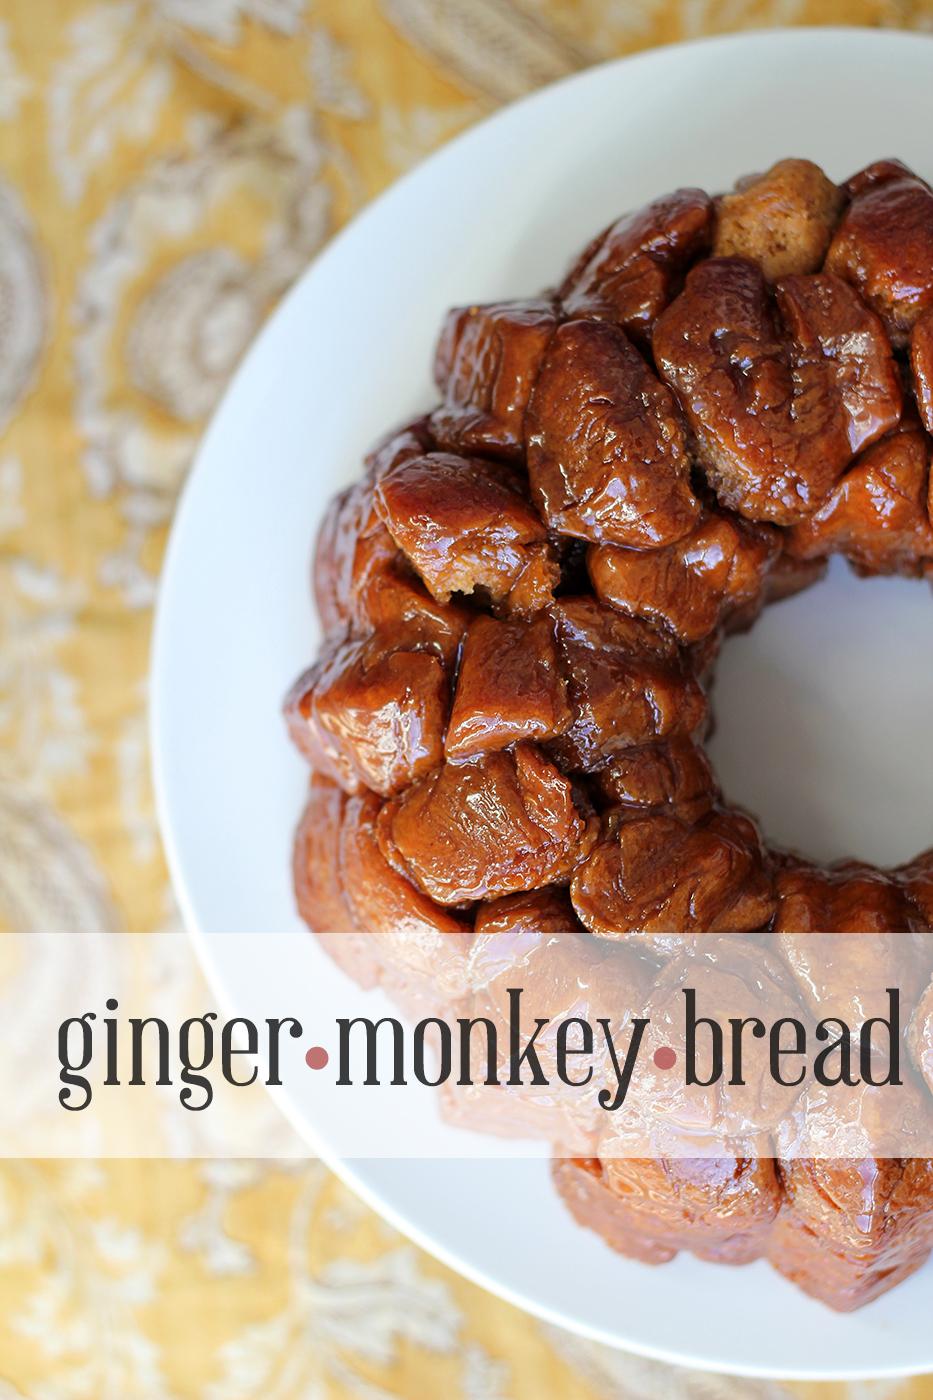 Eat like a monkey: Ginger(monkey)bread - Splash of Something